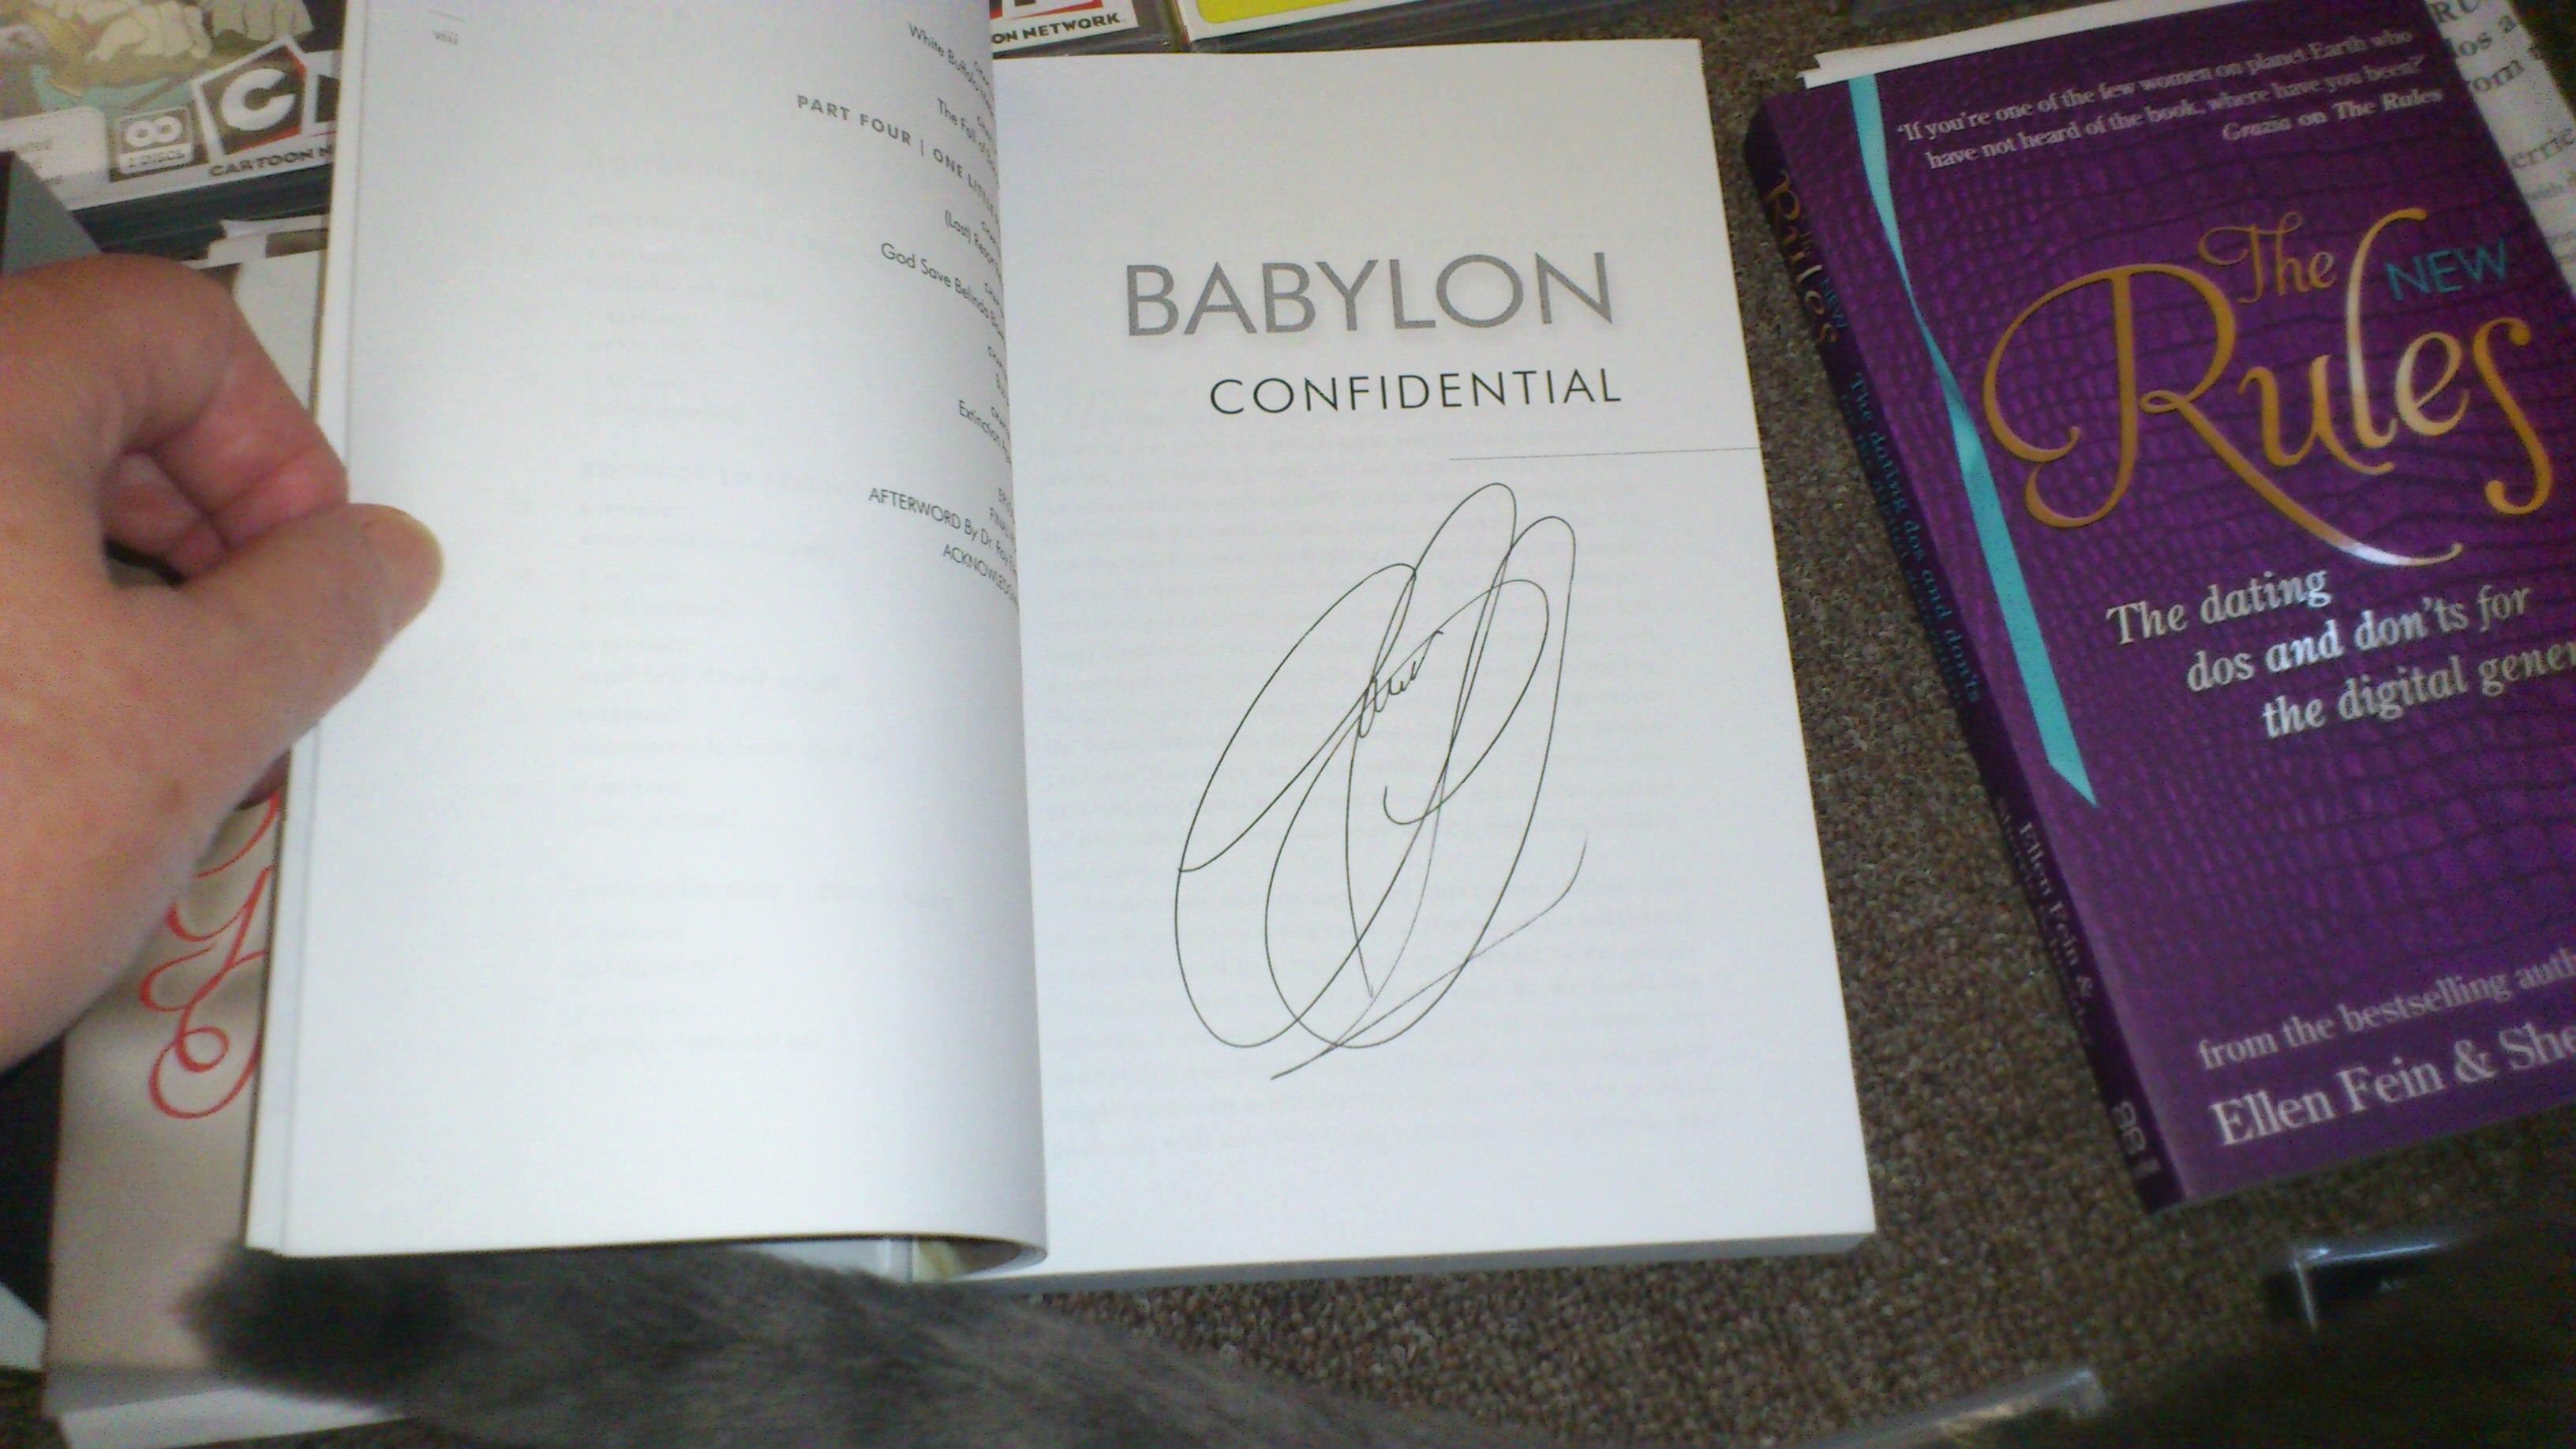 autographed copy of Babylon Confidential